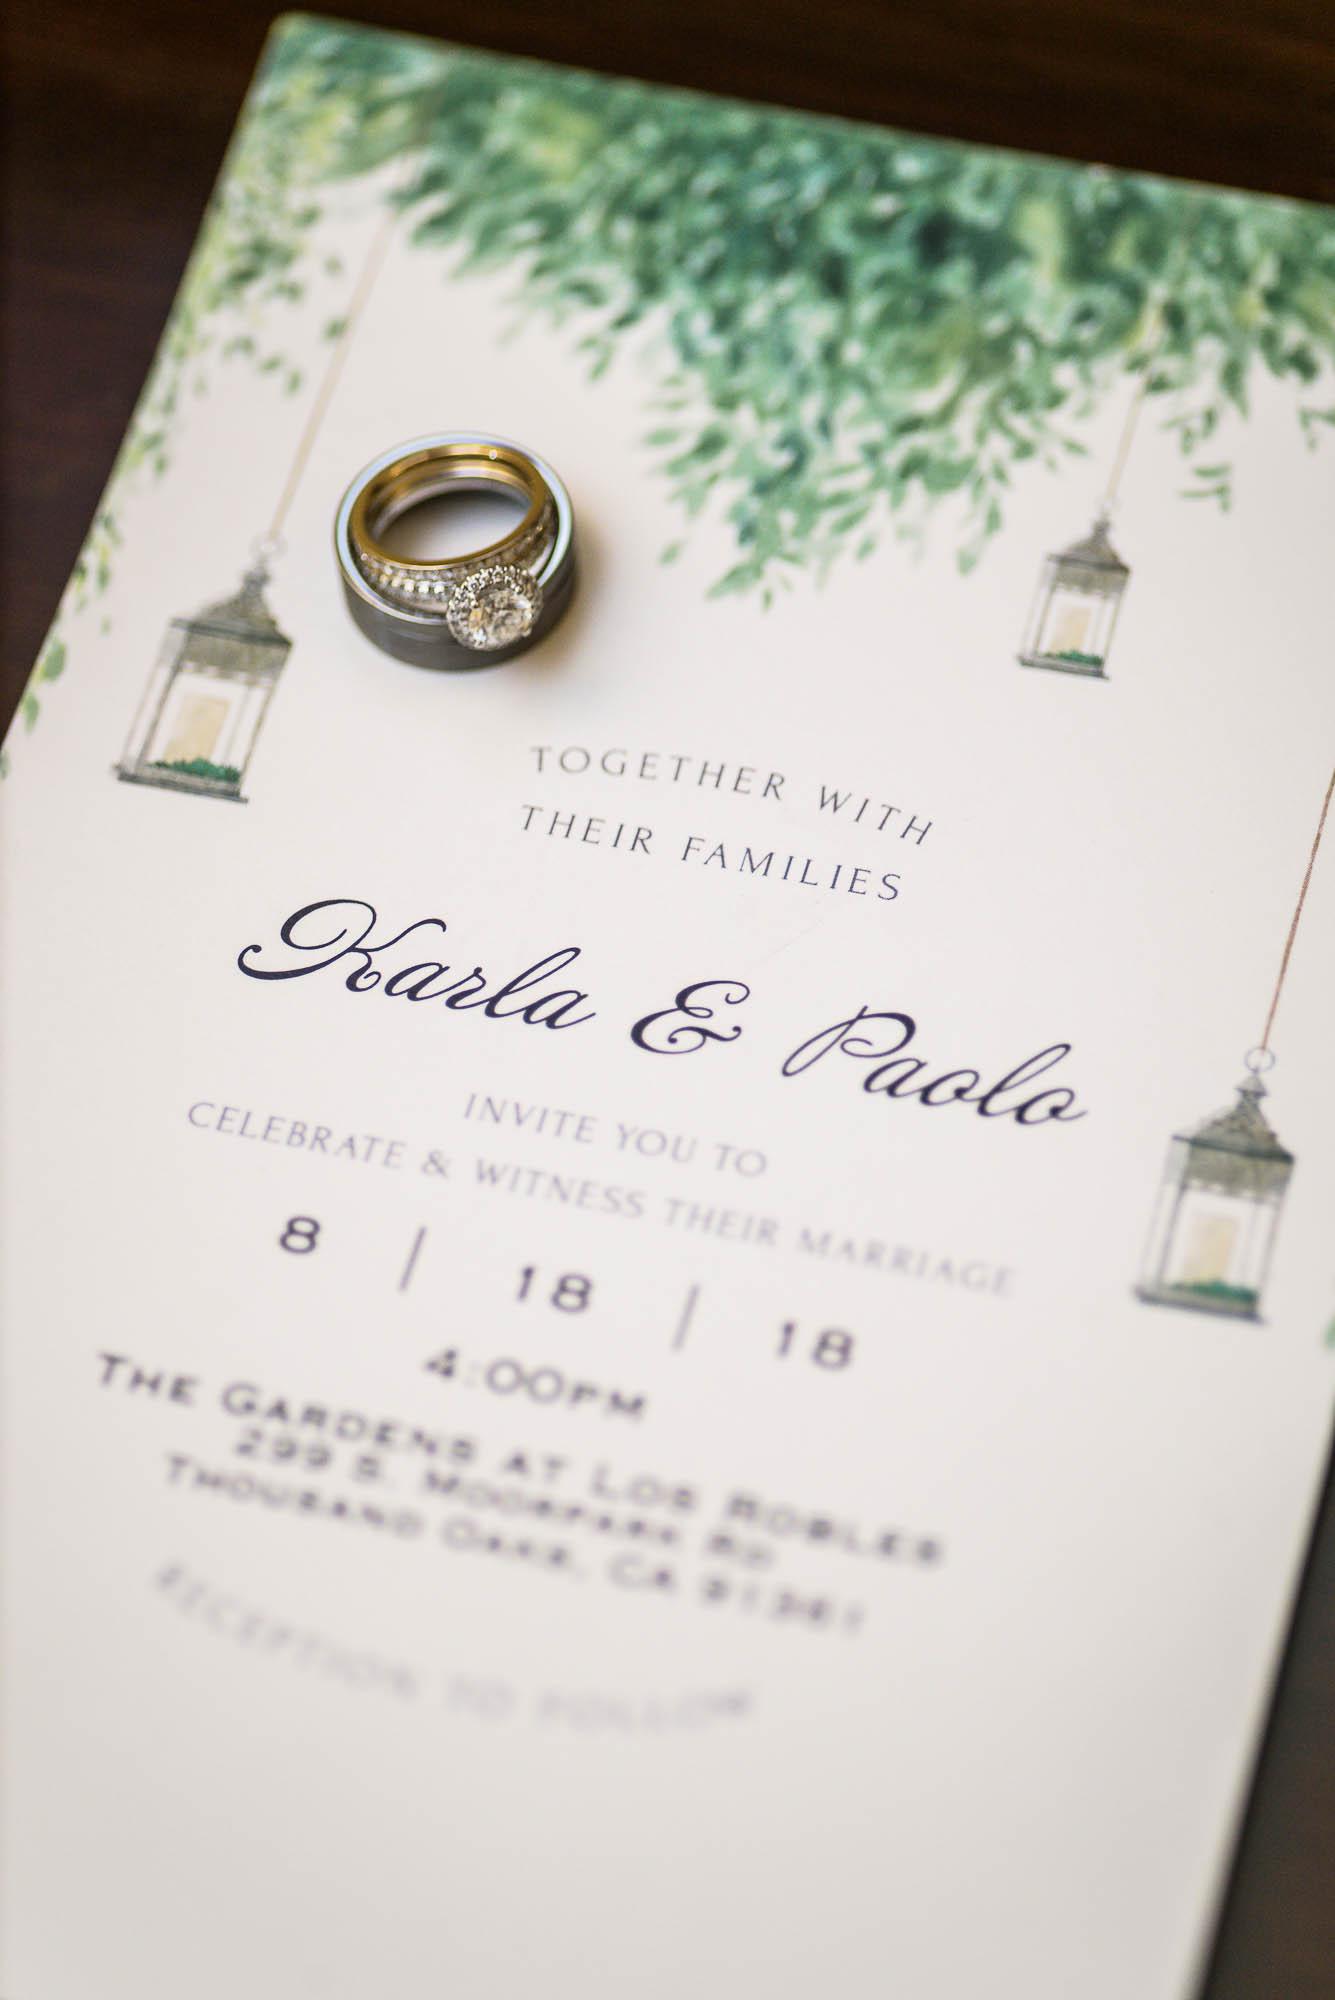 001_Alan_and_Heidi_Wedding_Karla_Paolo